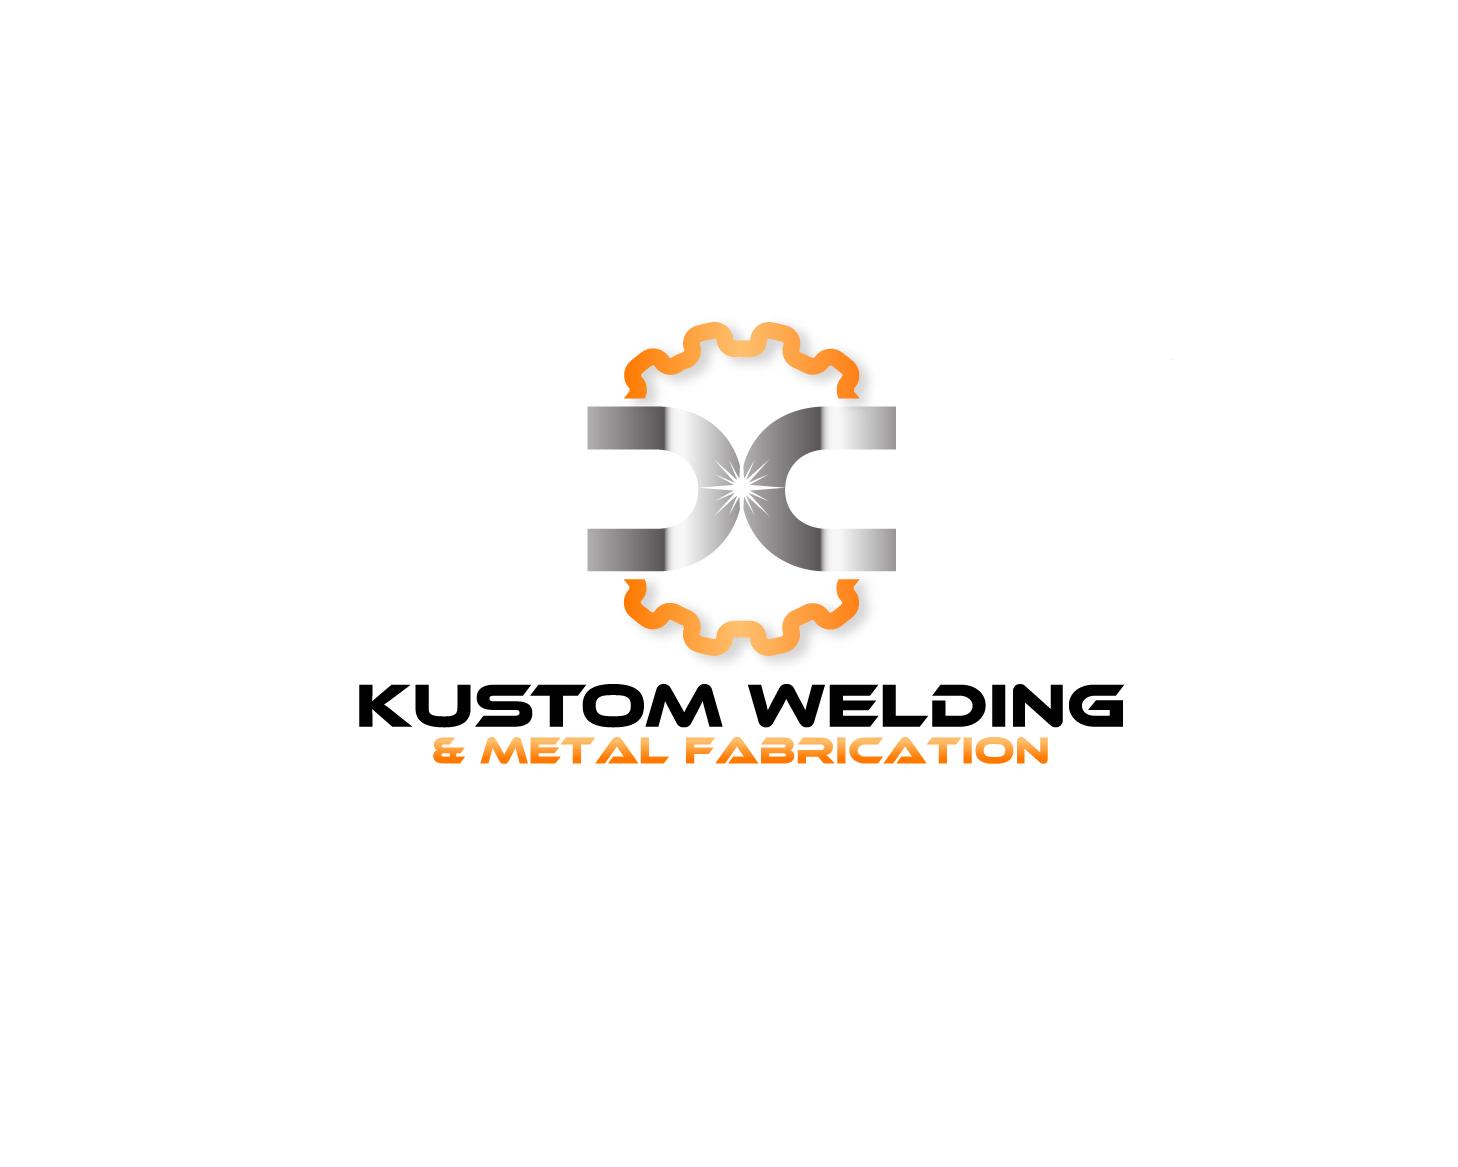 Logo Design by Allan Esclamado - Entry No. 11 in the Logo Design Contest Imaginative Logo Design for DC KUSTOM WELDING & METAL FABRICATION.